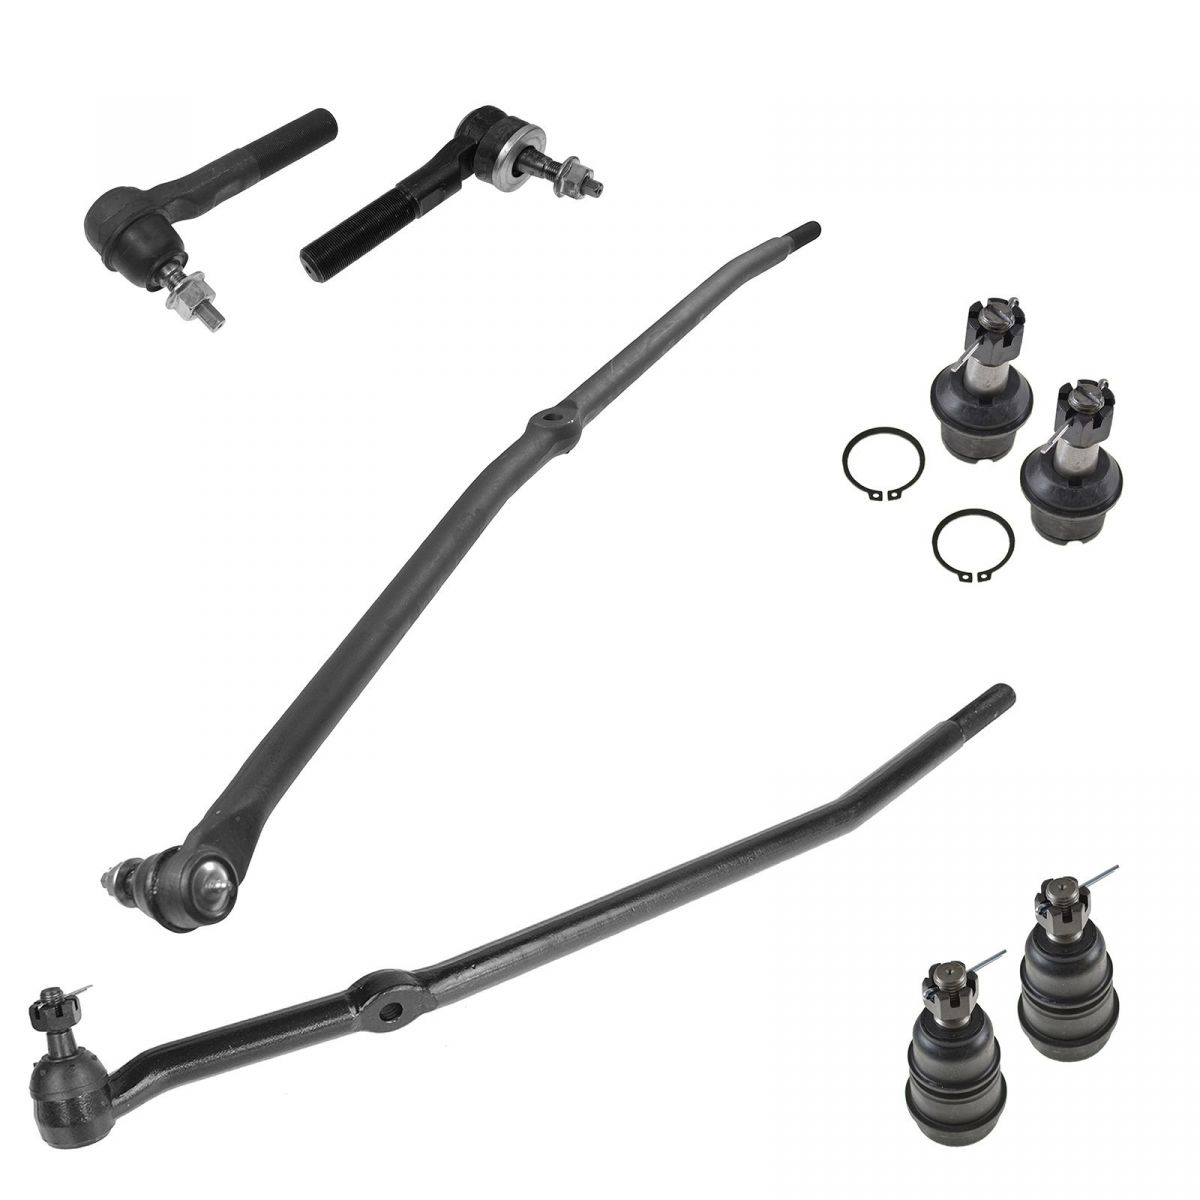 Auto Parts & Accessories Car & Truck Suspension & Steering